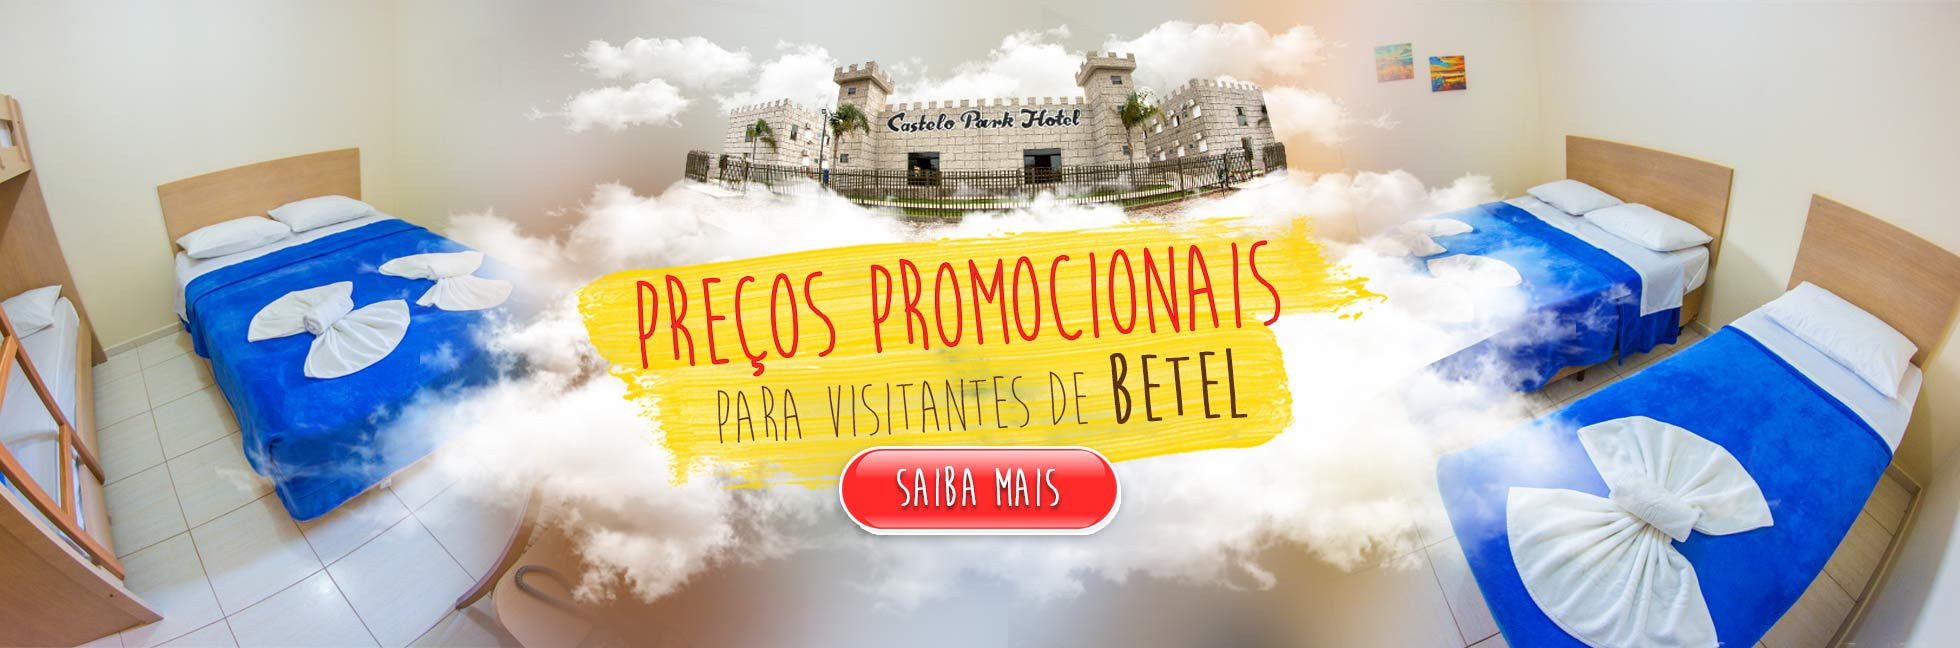 Preços Promocionais para Visitantes de Betel